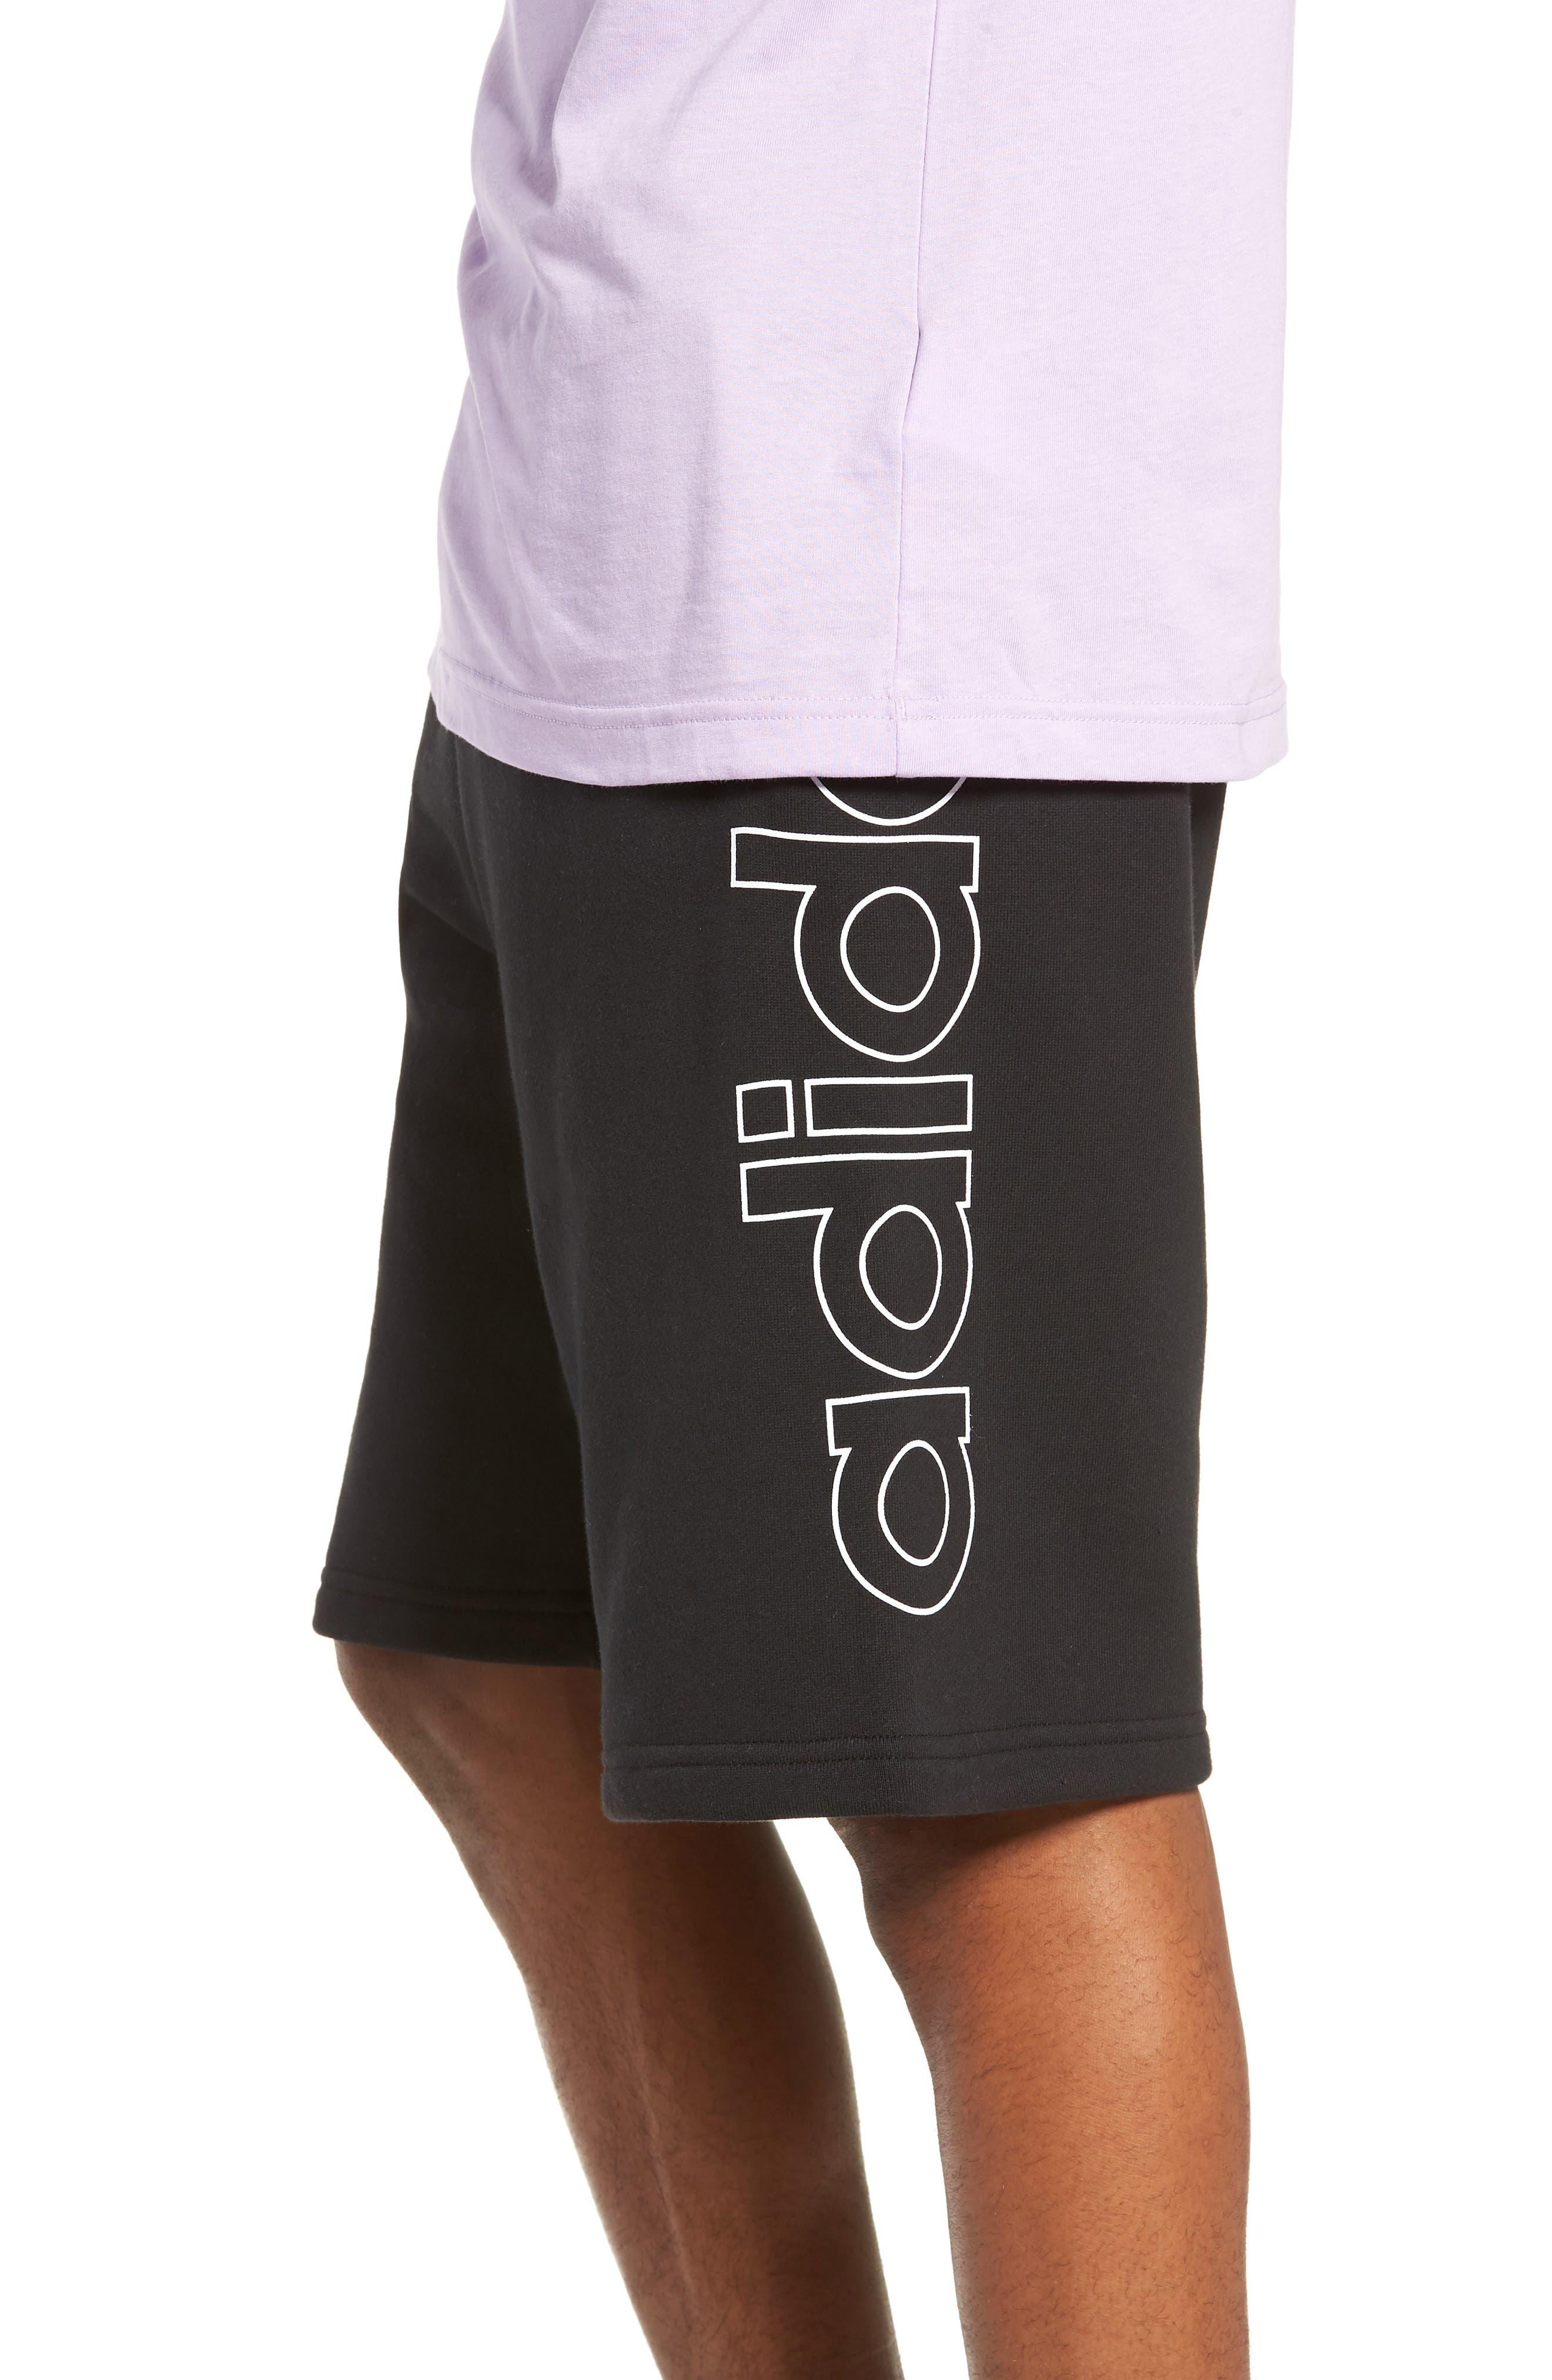 ADIDAS ORIGINALS, FT OTLN Athletic Shorts, Alternate thumbnail 4, color, BLACK/ WHITE